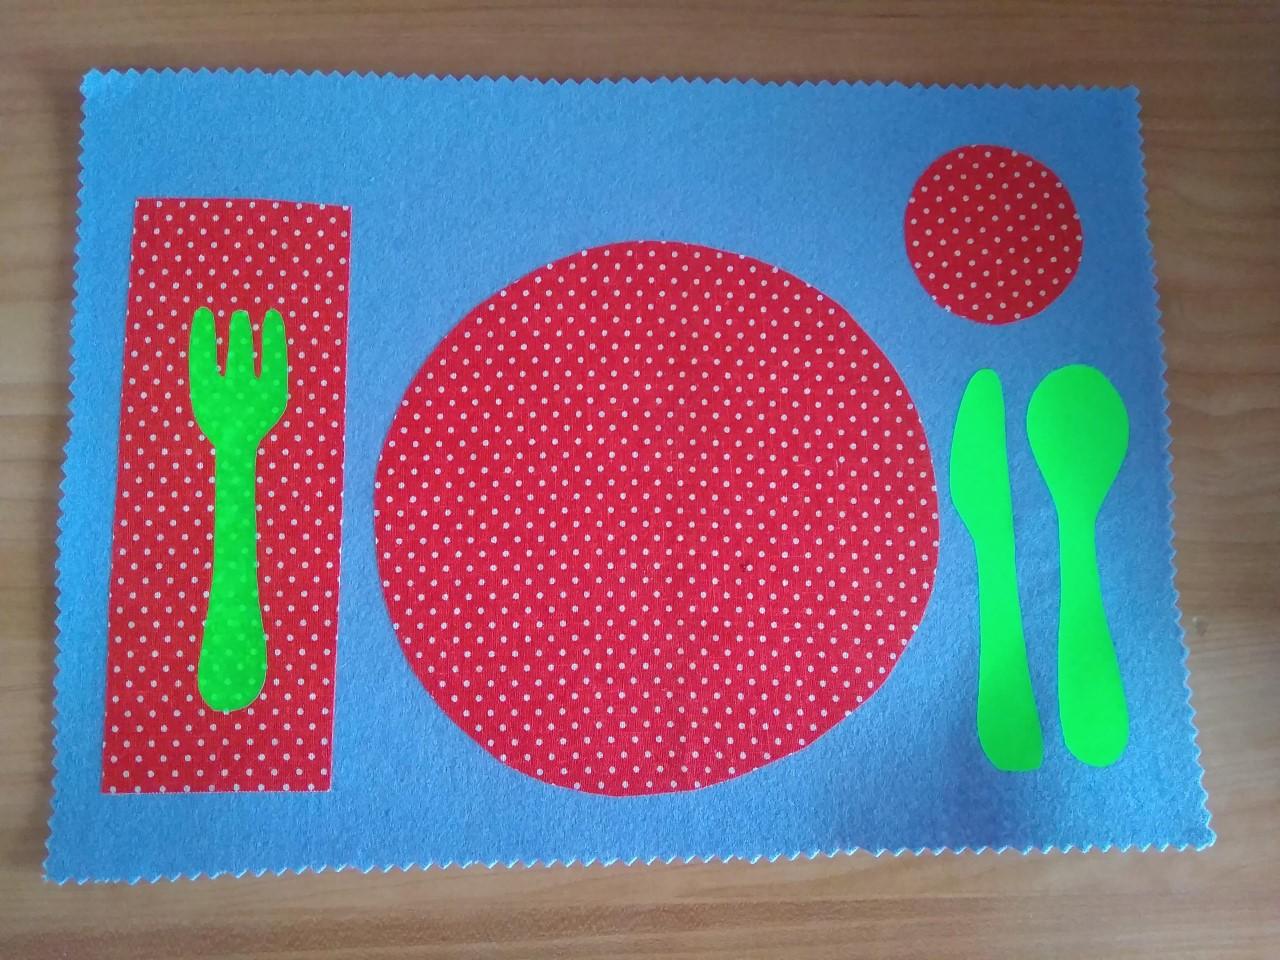 Mantel Montessori individual hecho a mano